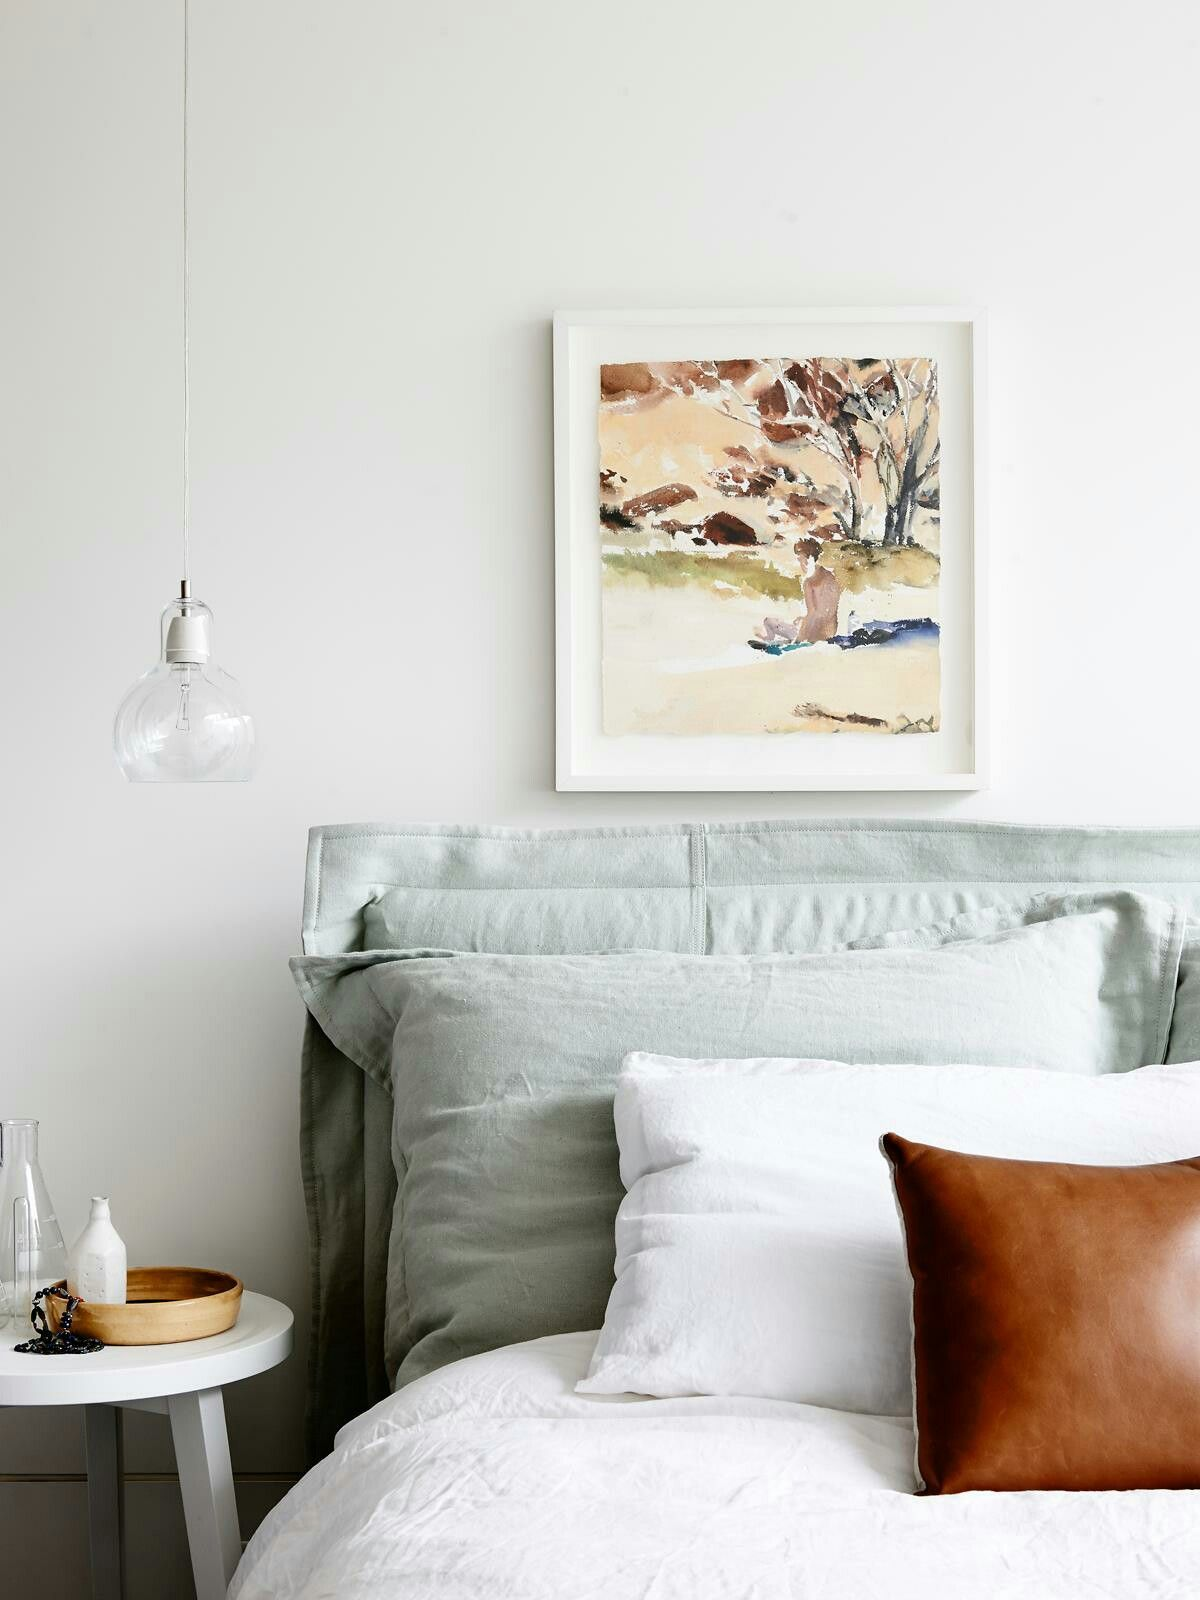 Pin by Anna Helms on sleep tight Bedroom interior